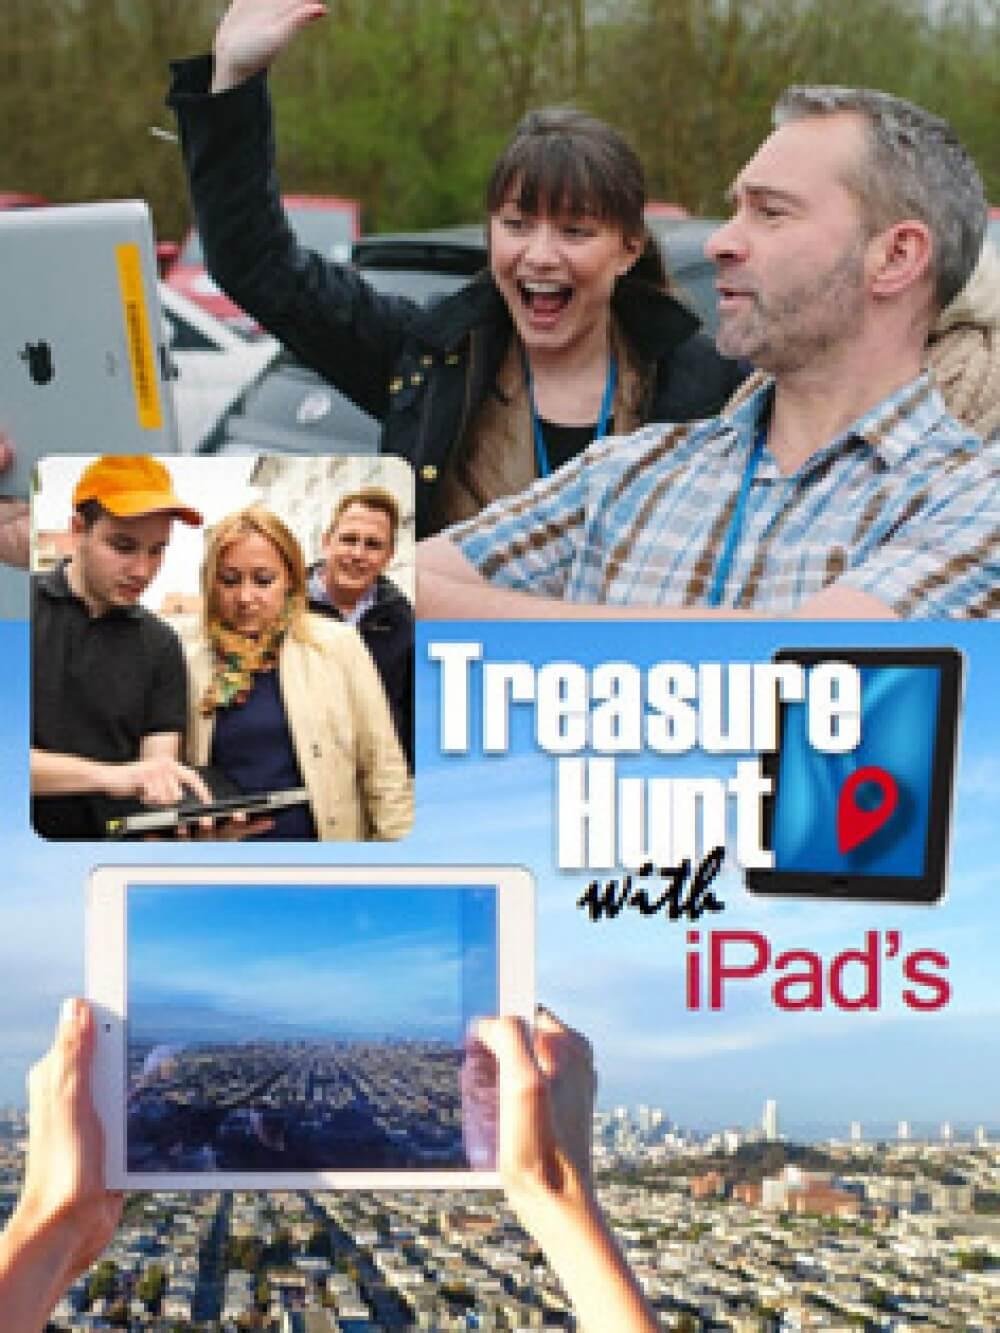 treasure_hunt_with_iPads_vertical_web